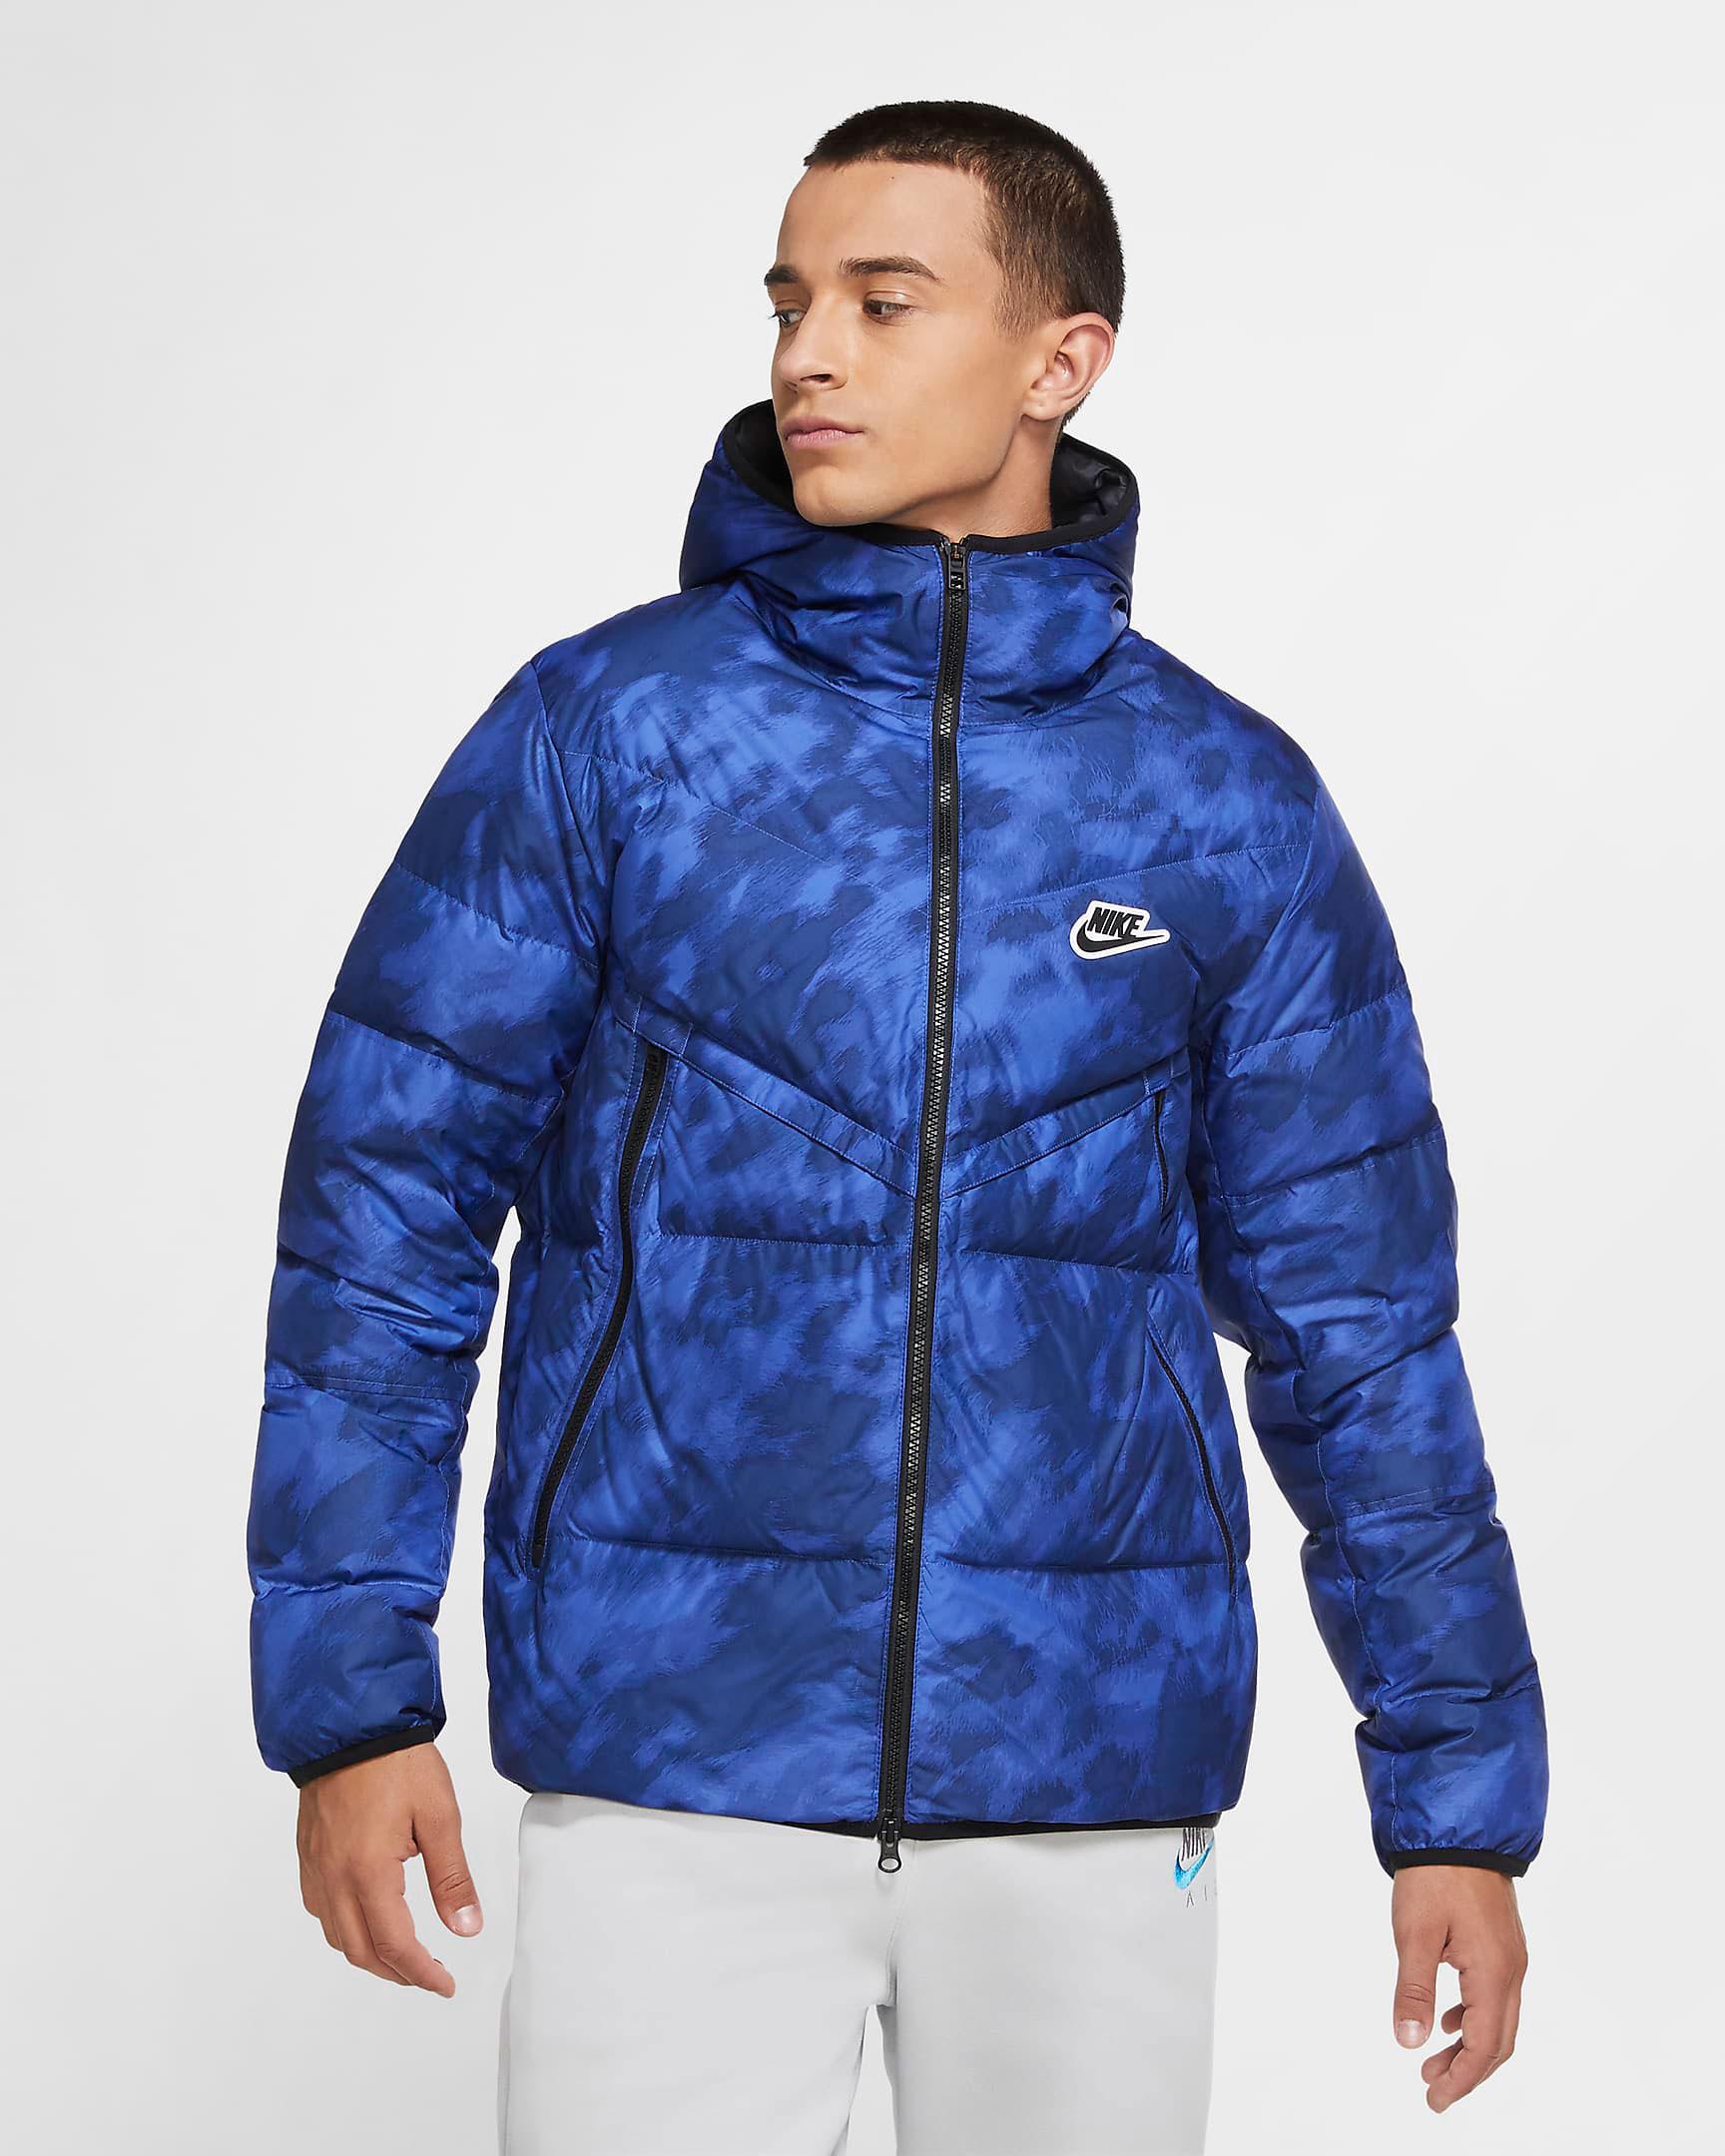 jordan-13-hyper-royal-black-nike-winter-jacket-1